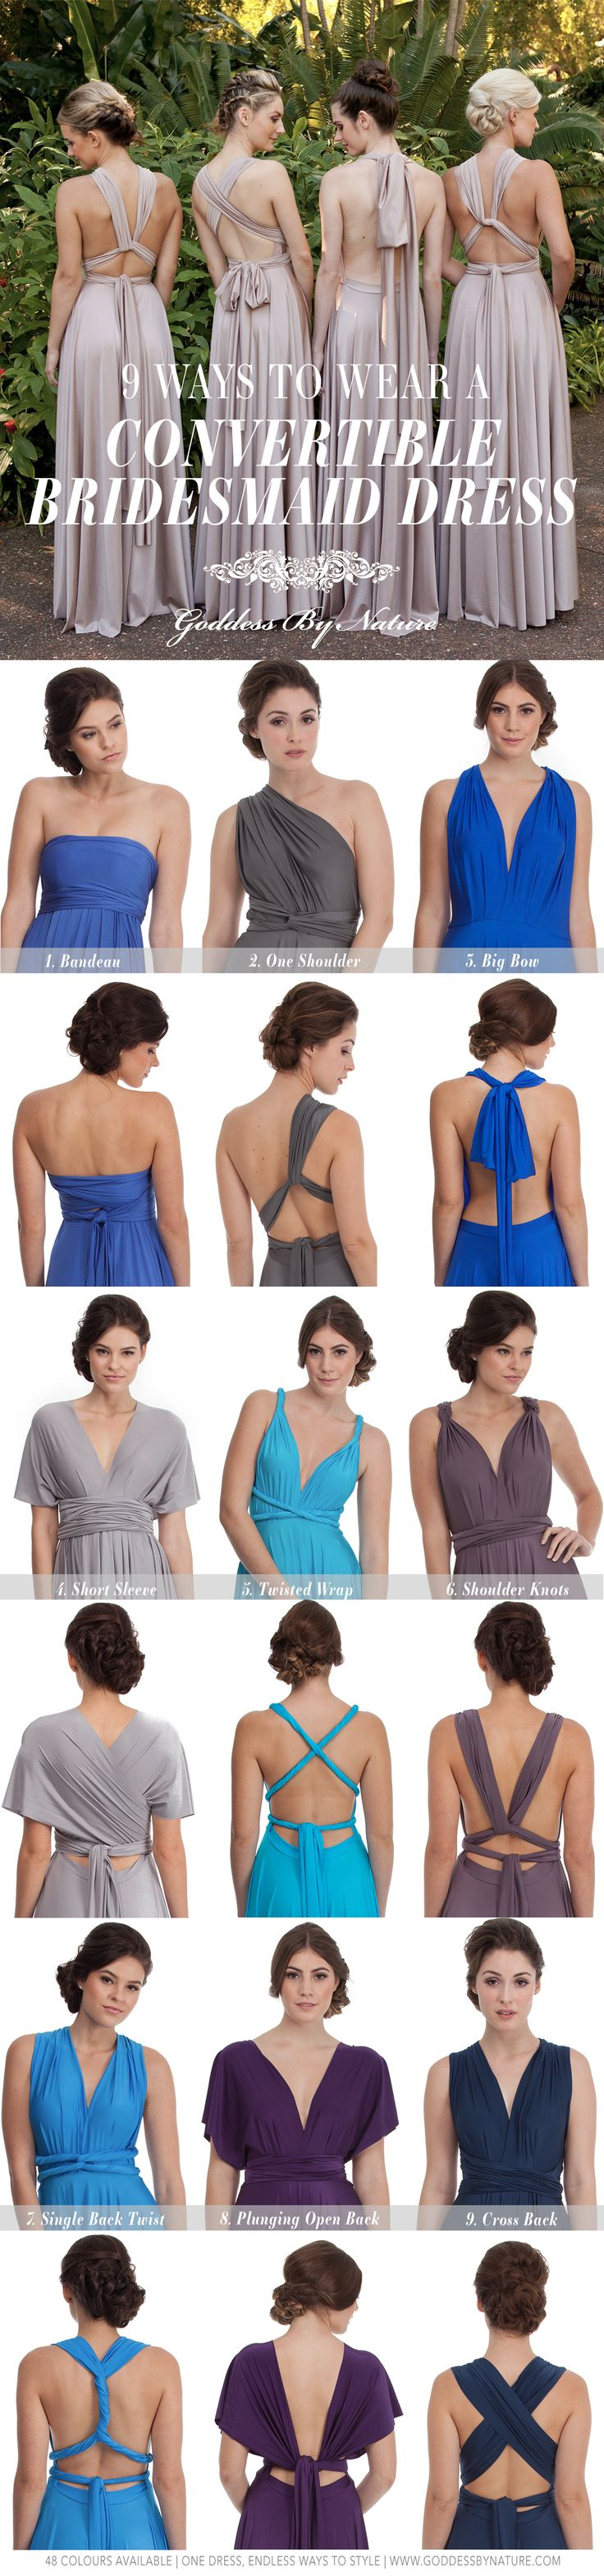 9 Ways To Wear A Multiway Bridesmaid Dress! 48 Colours Available | Shop Online www.shop.goddessbynature.com